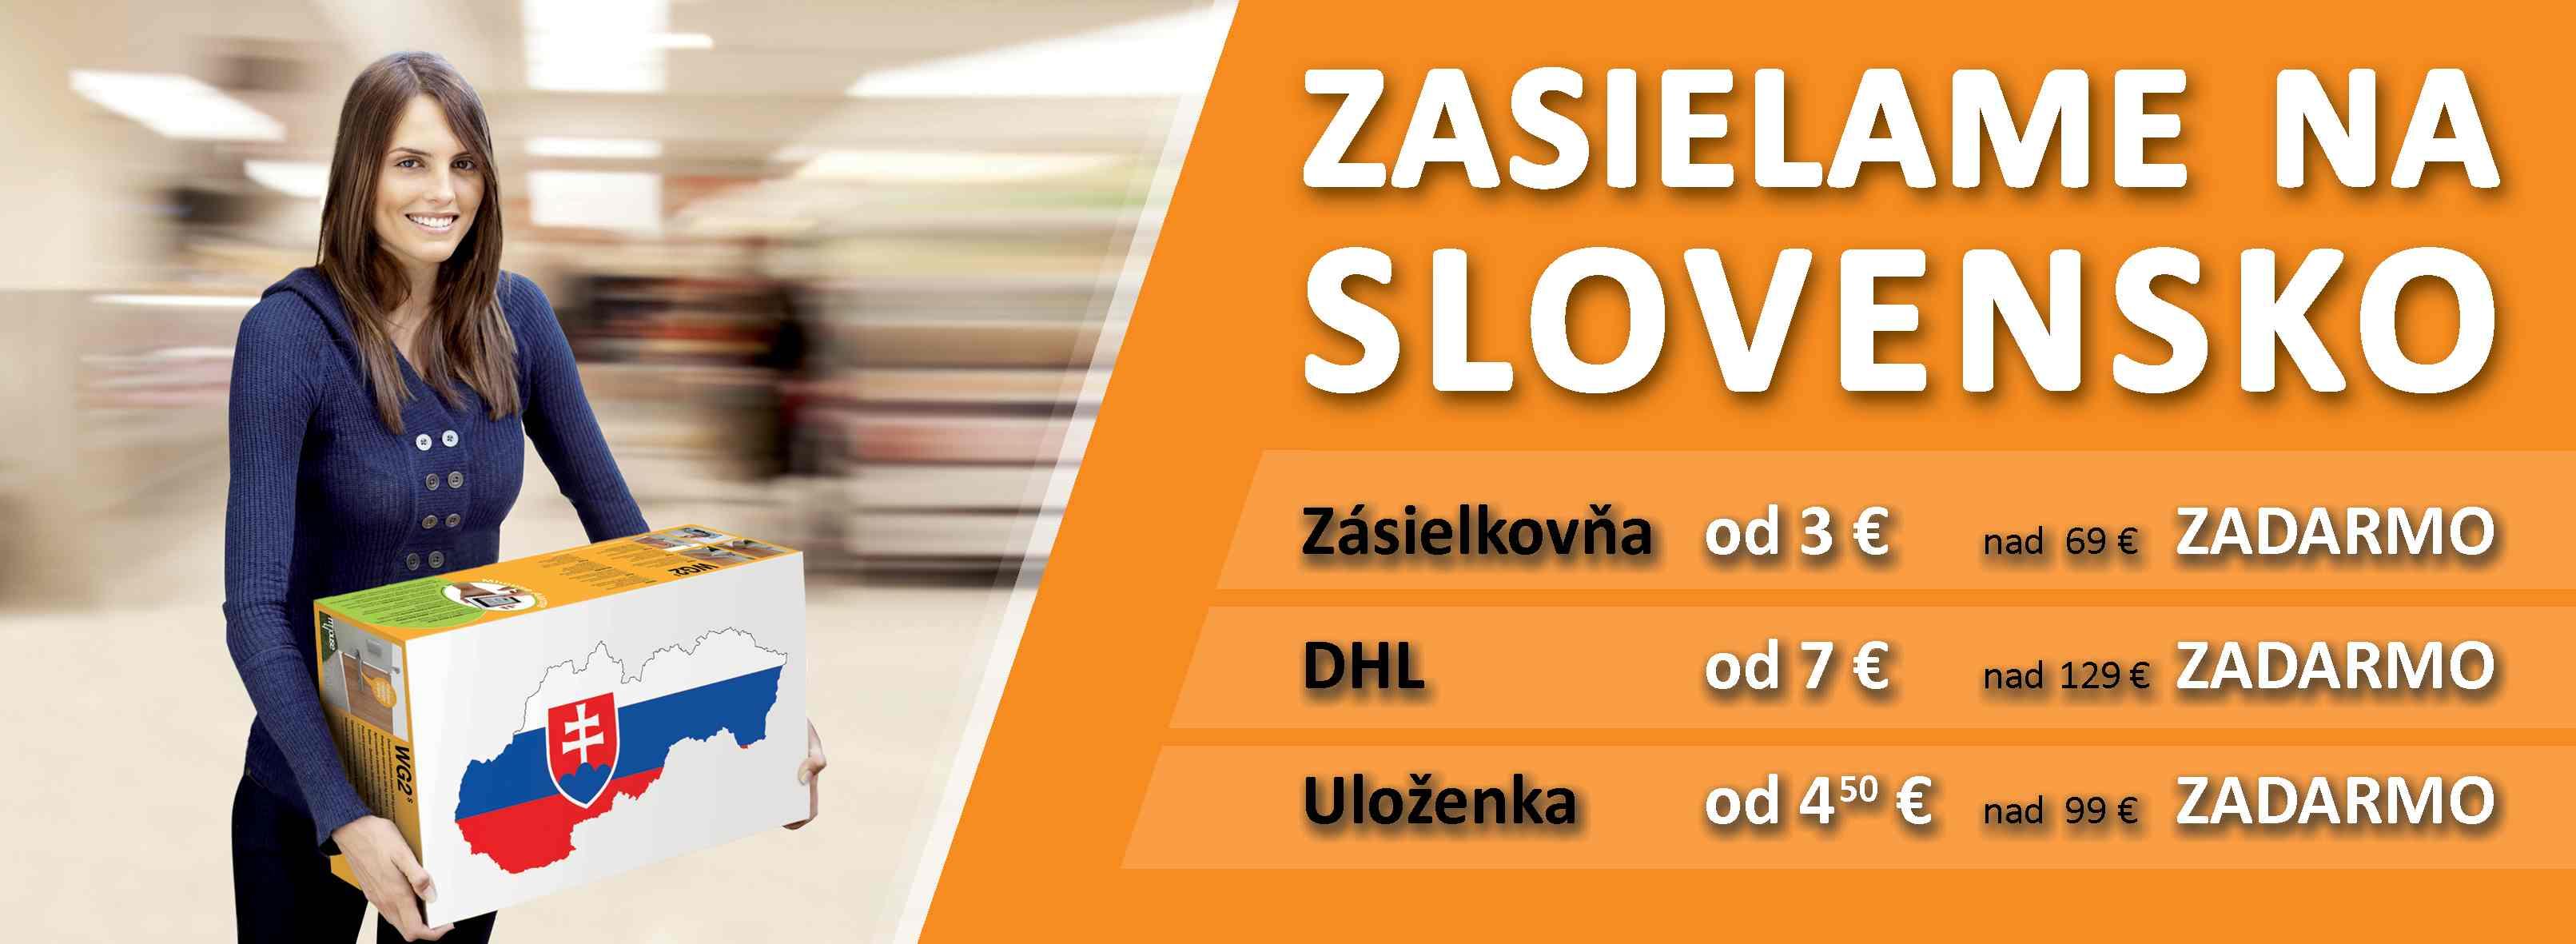 Přehled dopravy Slovensko - Pohony-Mhouse.cz